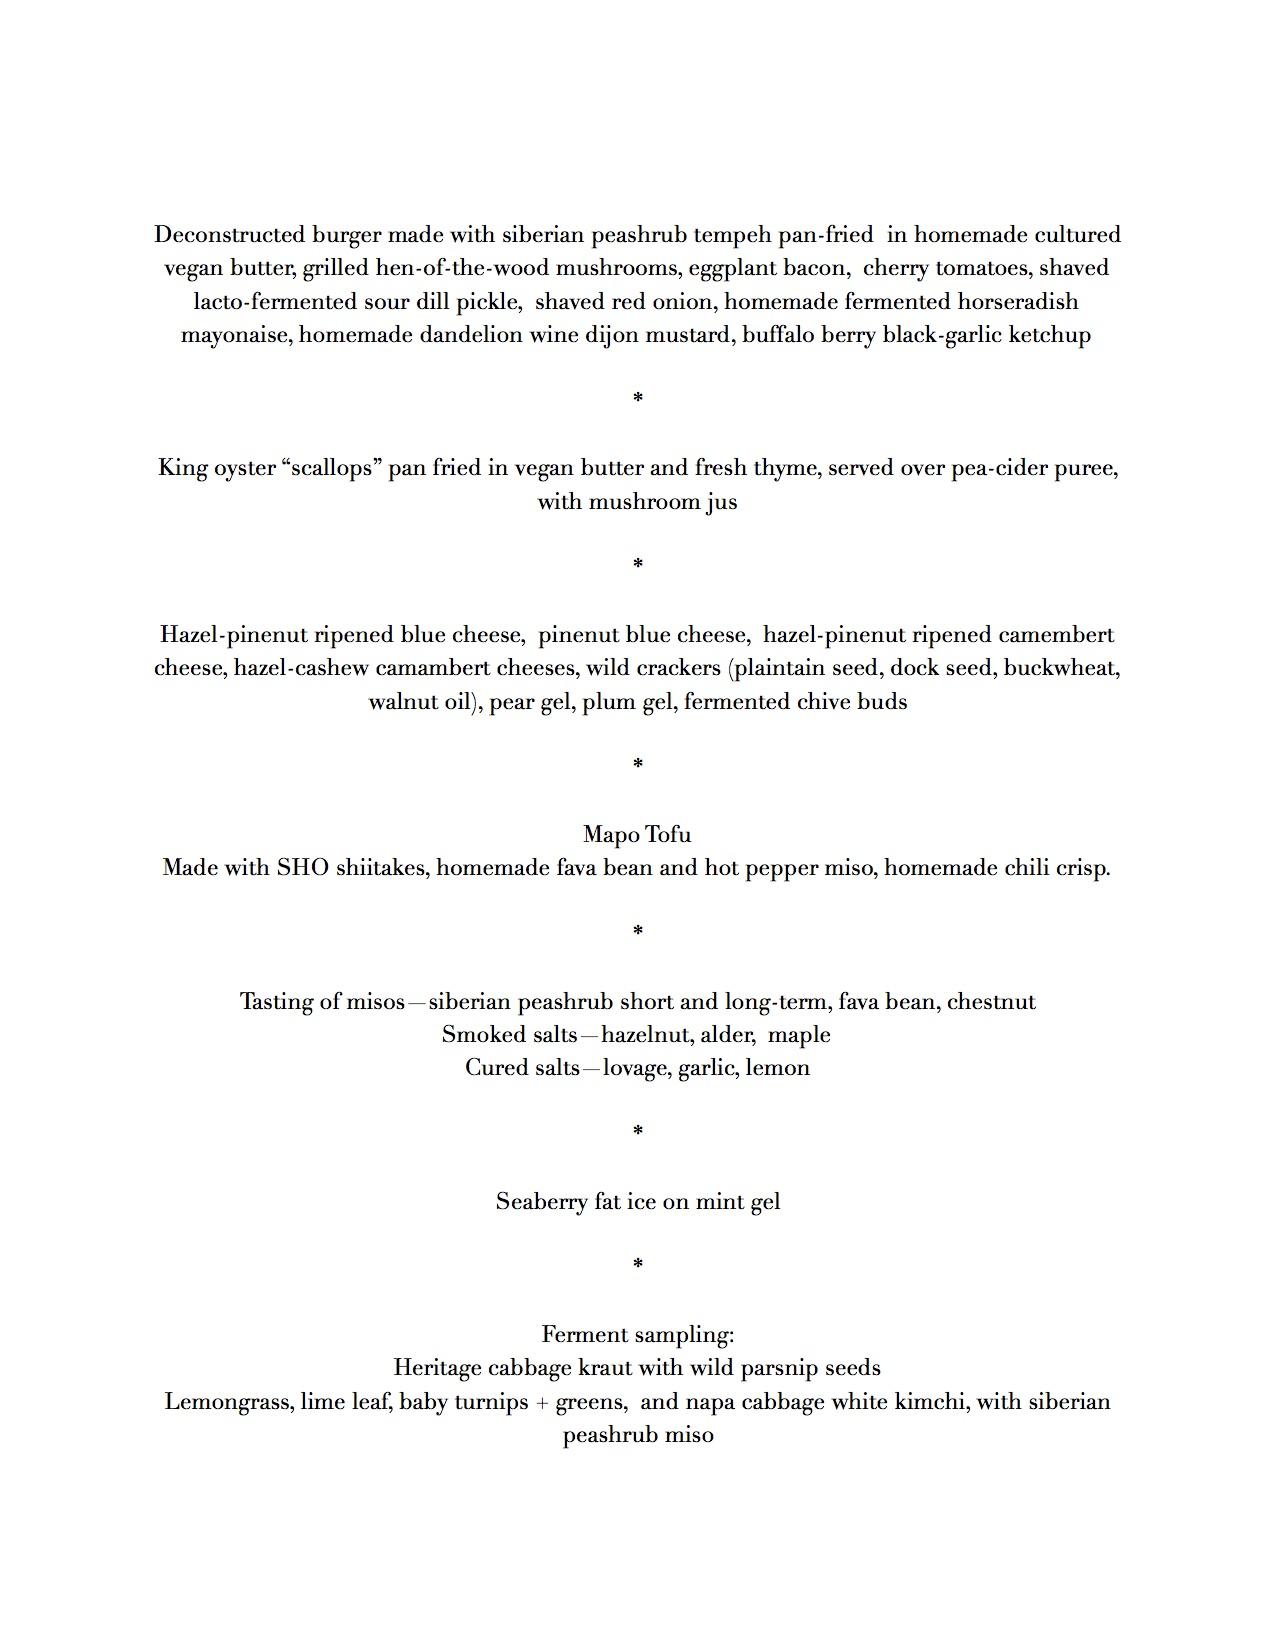 Sept 30 Menu page 2.jpg